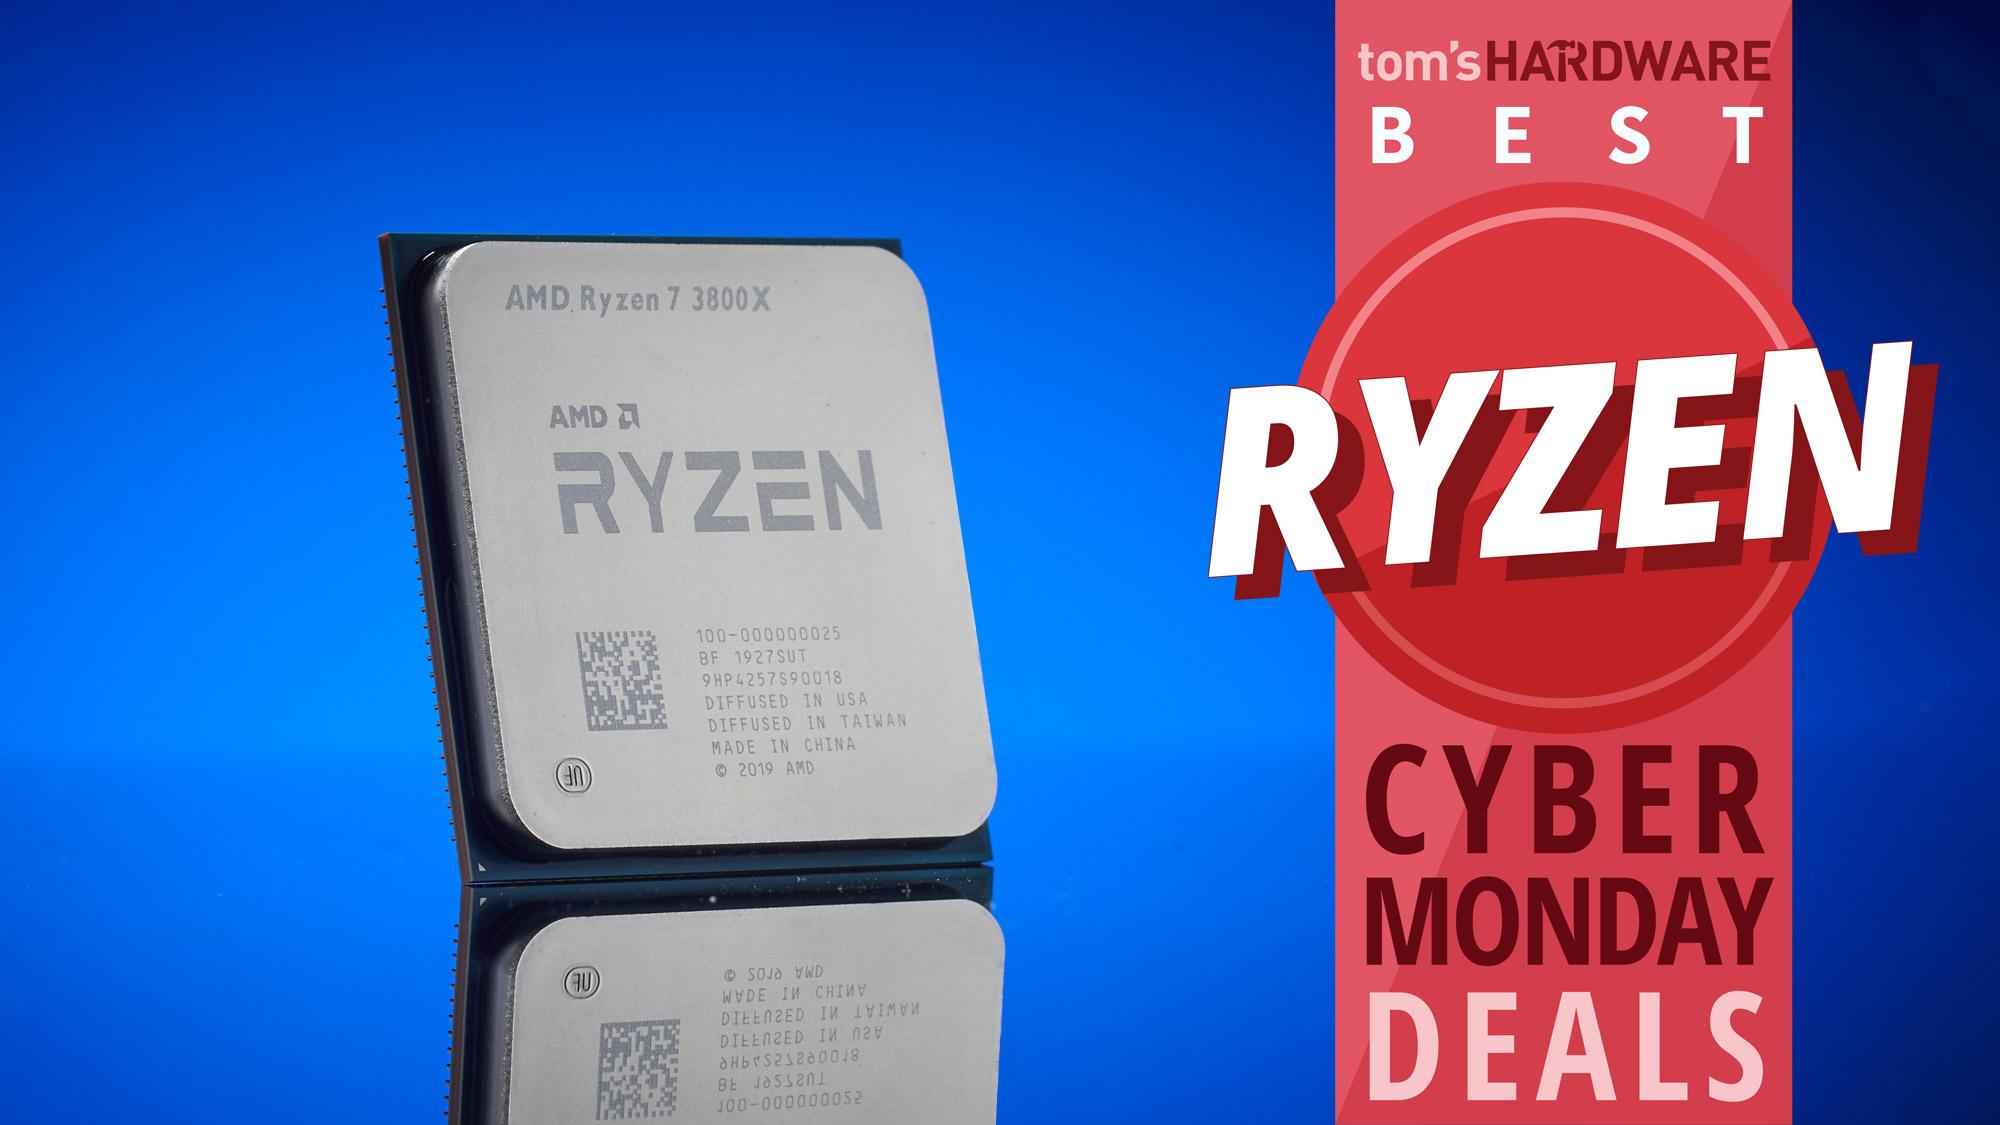 Best Cyber Monday Ryzen Deals Lowest Prices On Amd Cpus Tom S Hardware